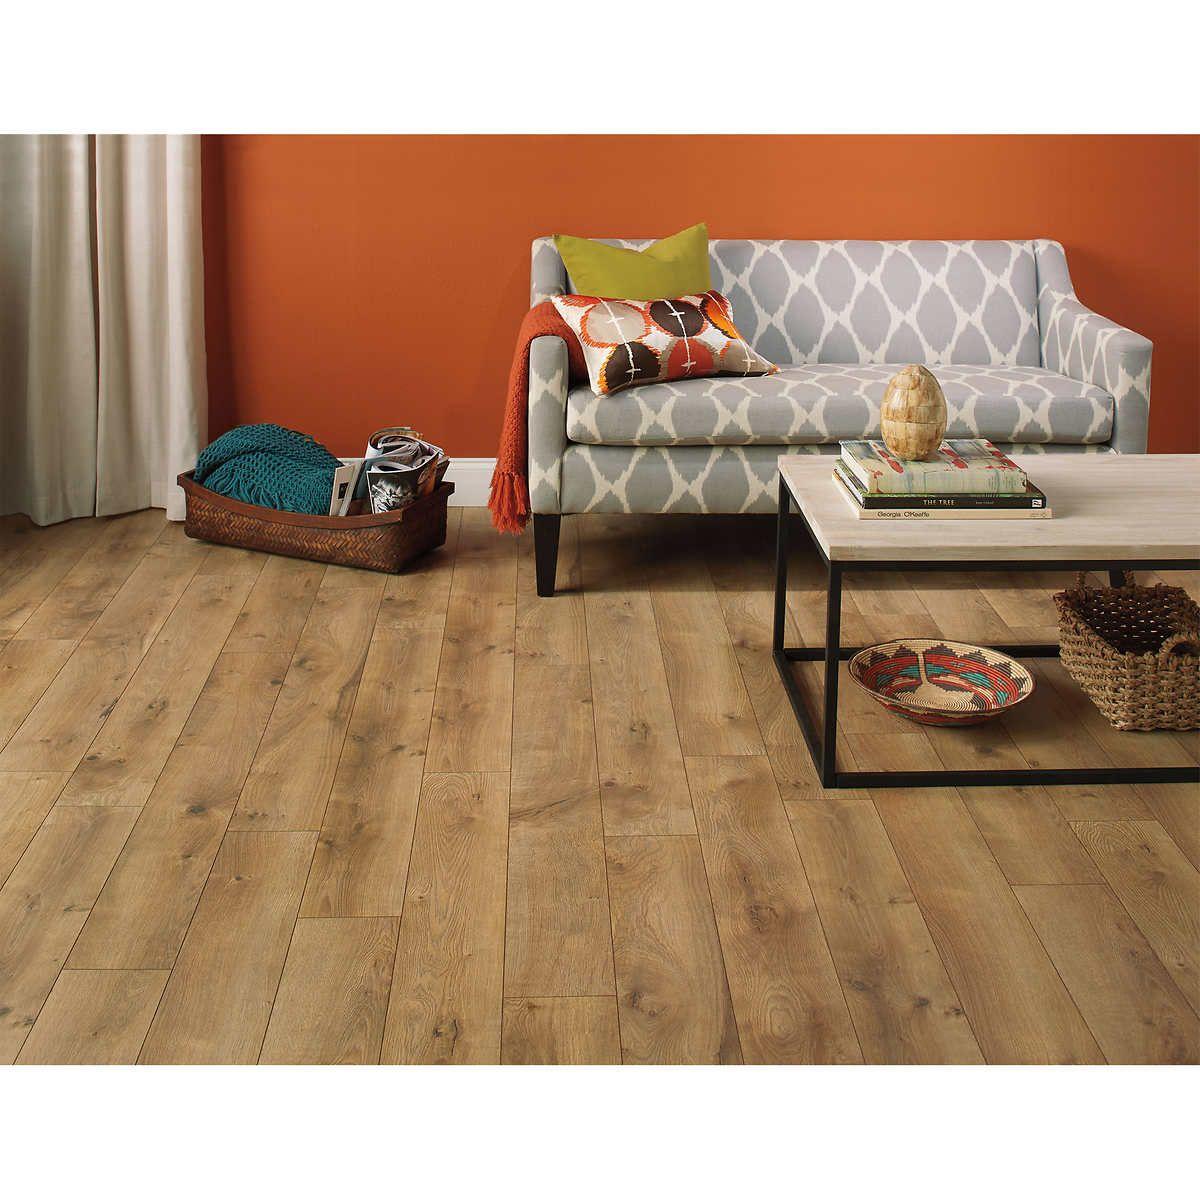 Http Www Costco Com Harmonics Camden Oak Laminate Flooring 20 15